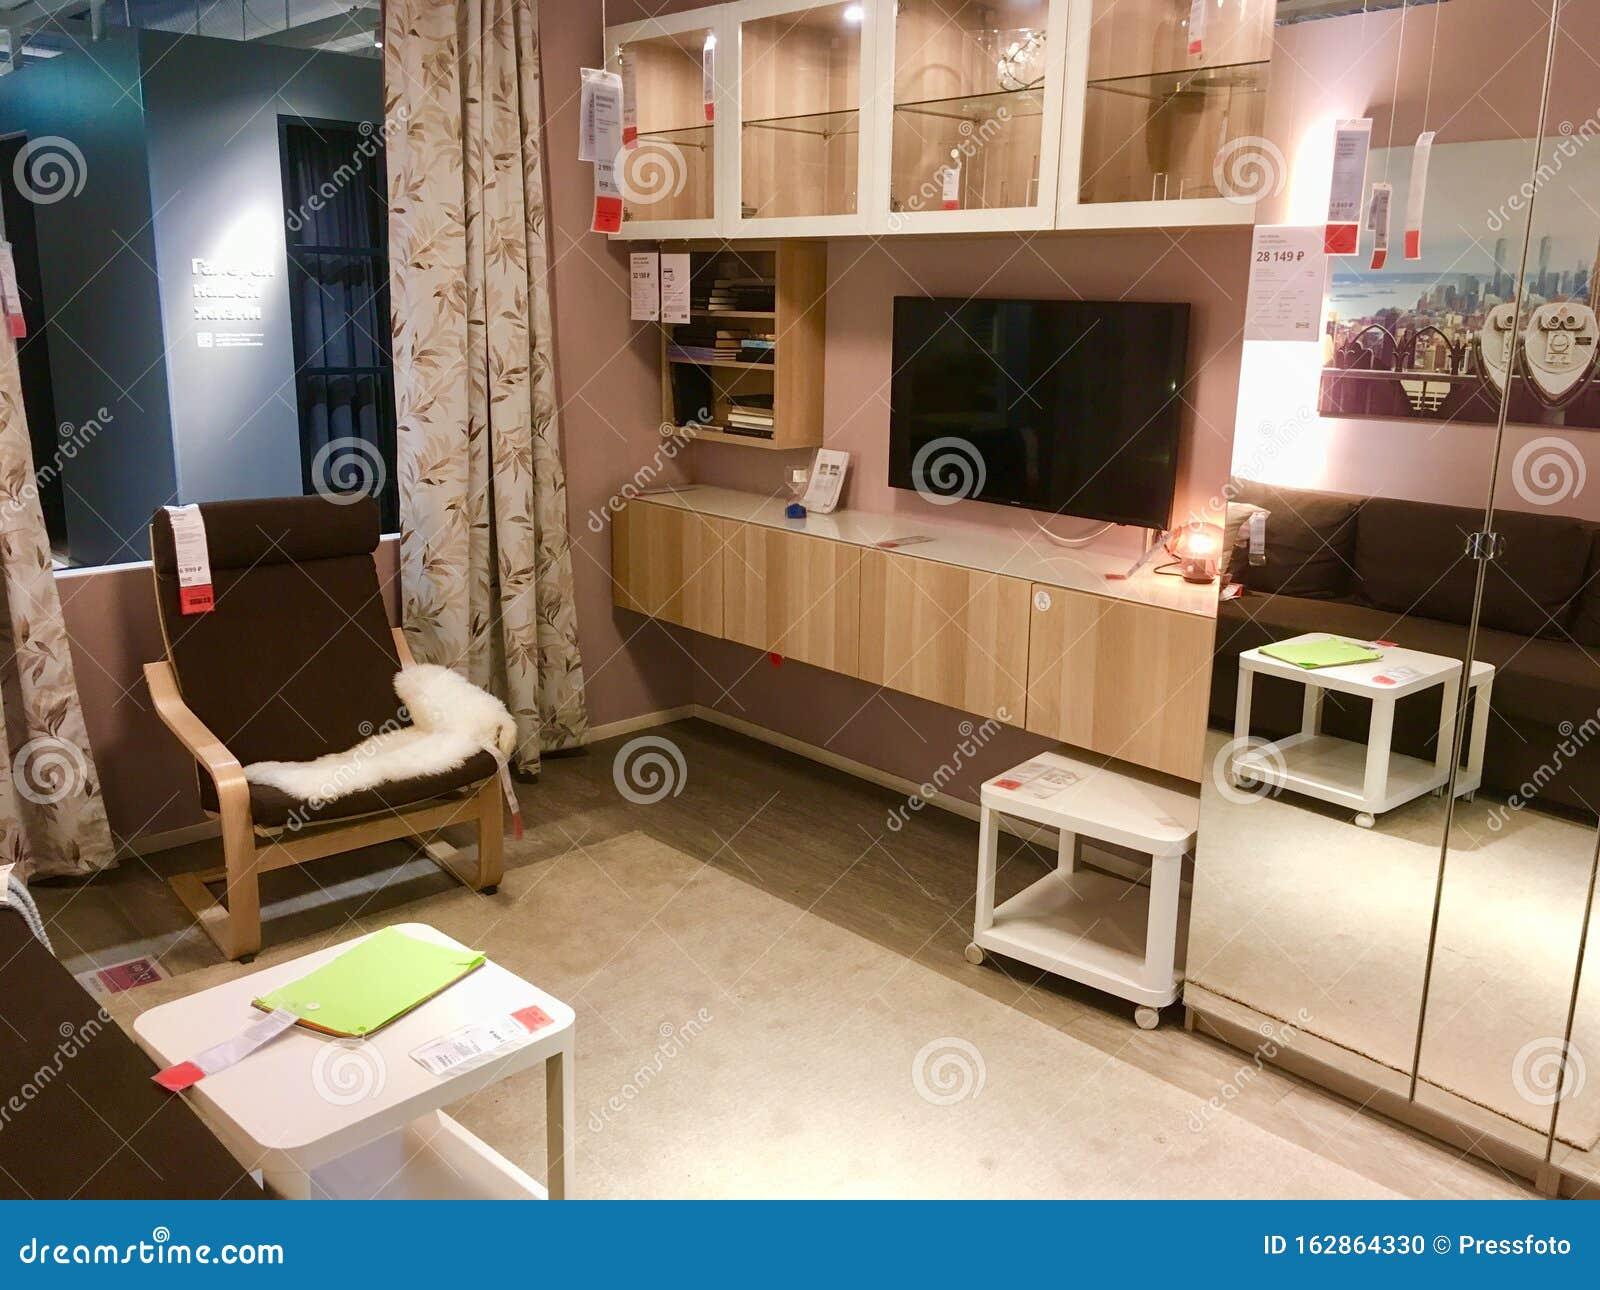 Ikea Living Room Photos ikea store living room design editorial image - image of